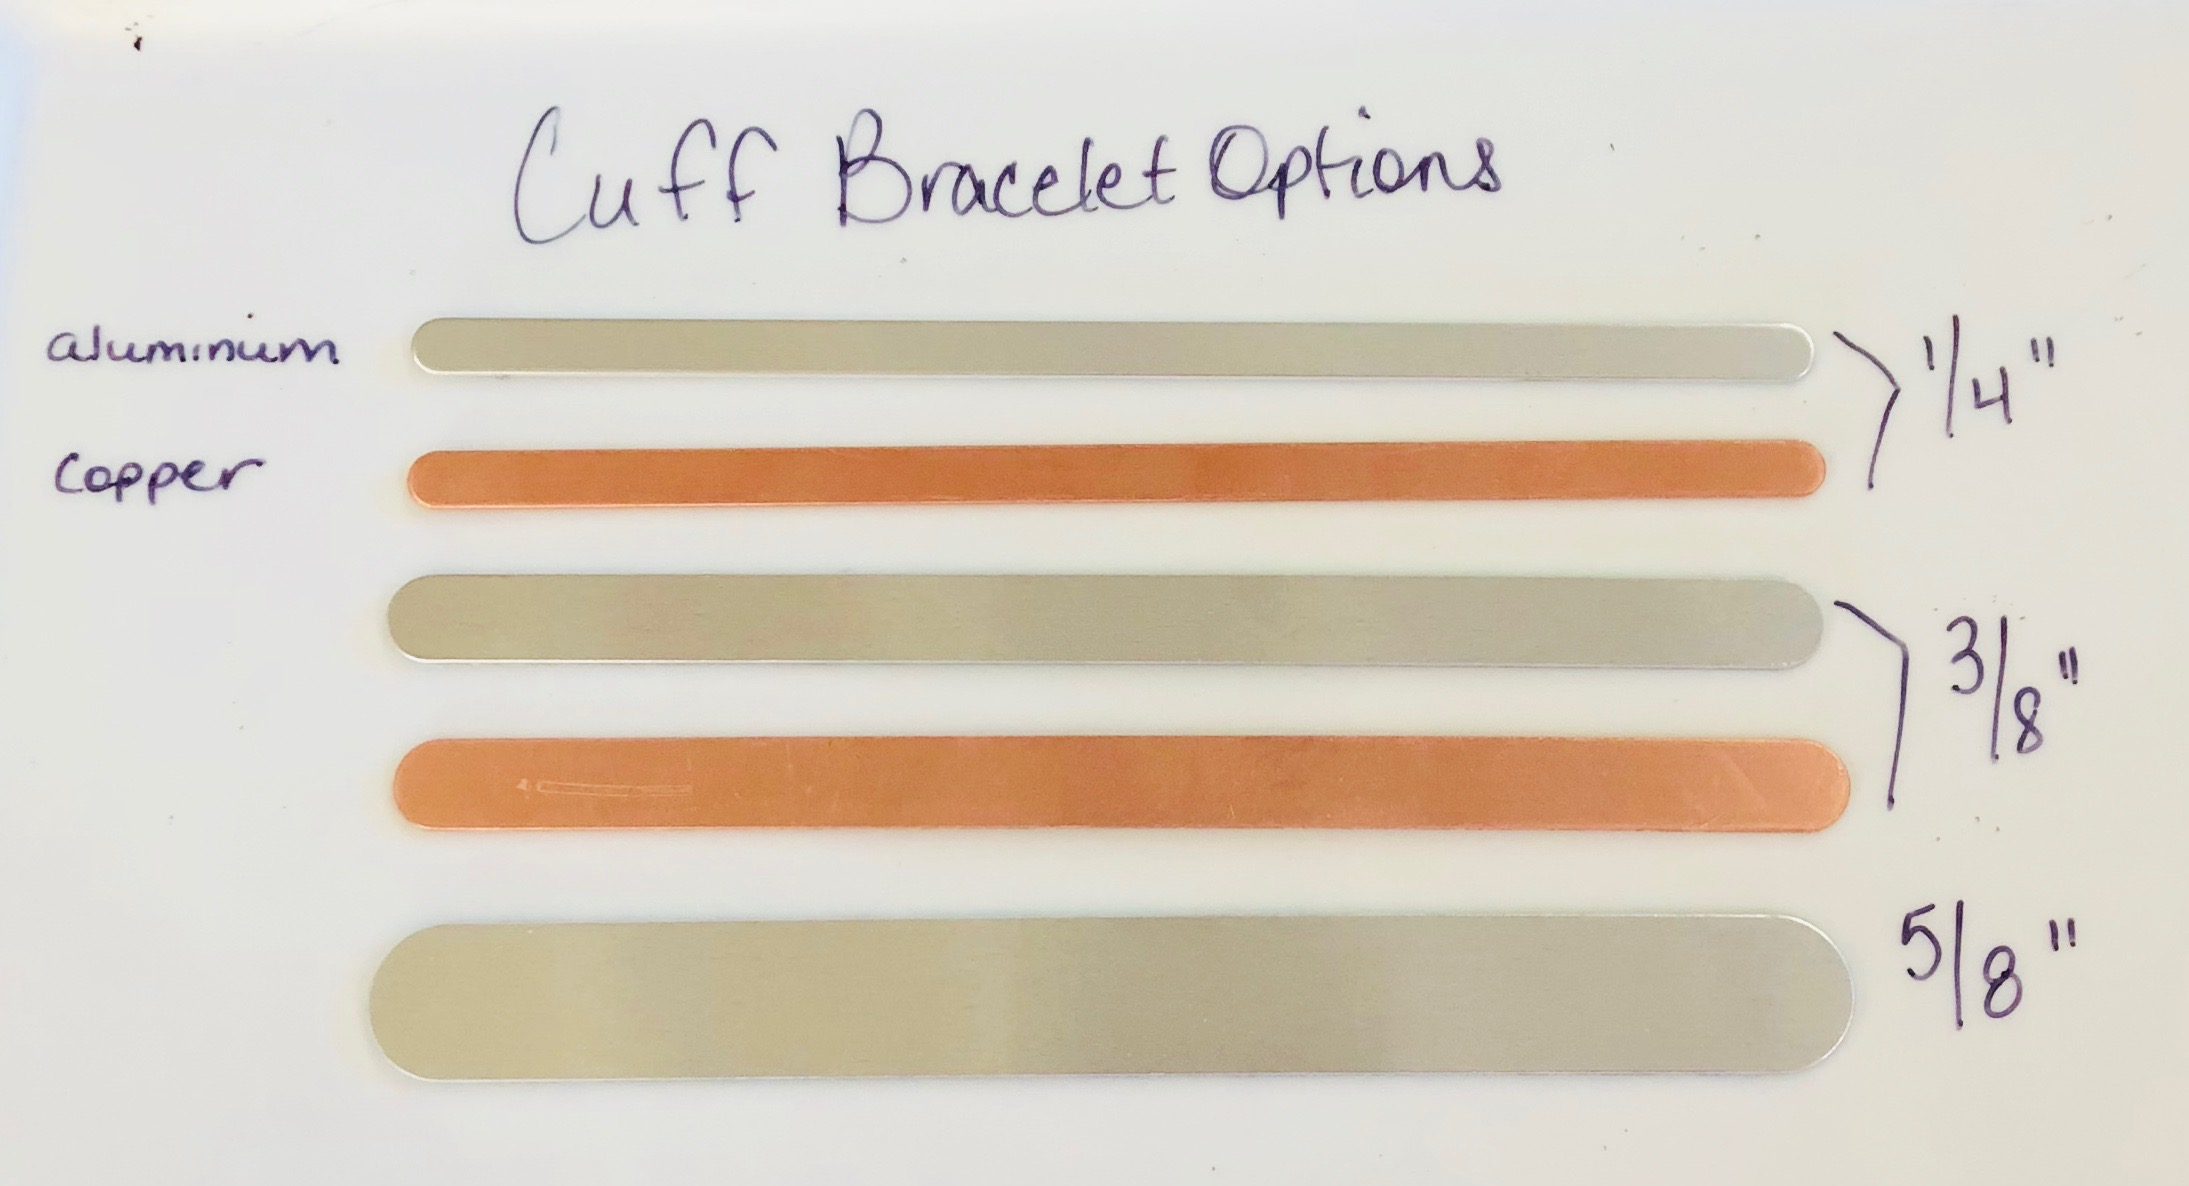 cuff-bracelet-options.jpg